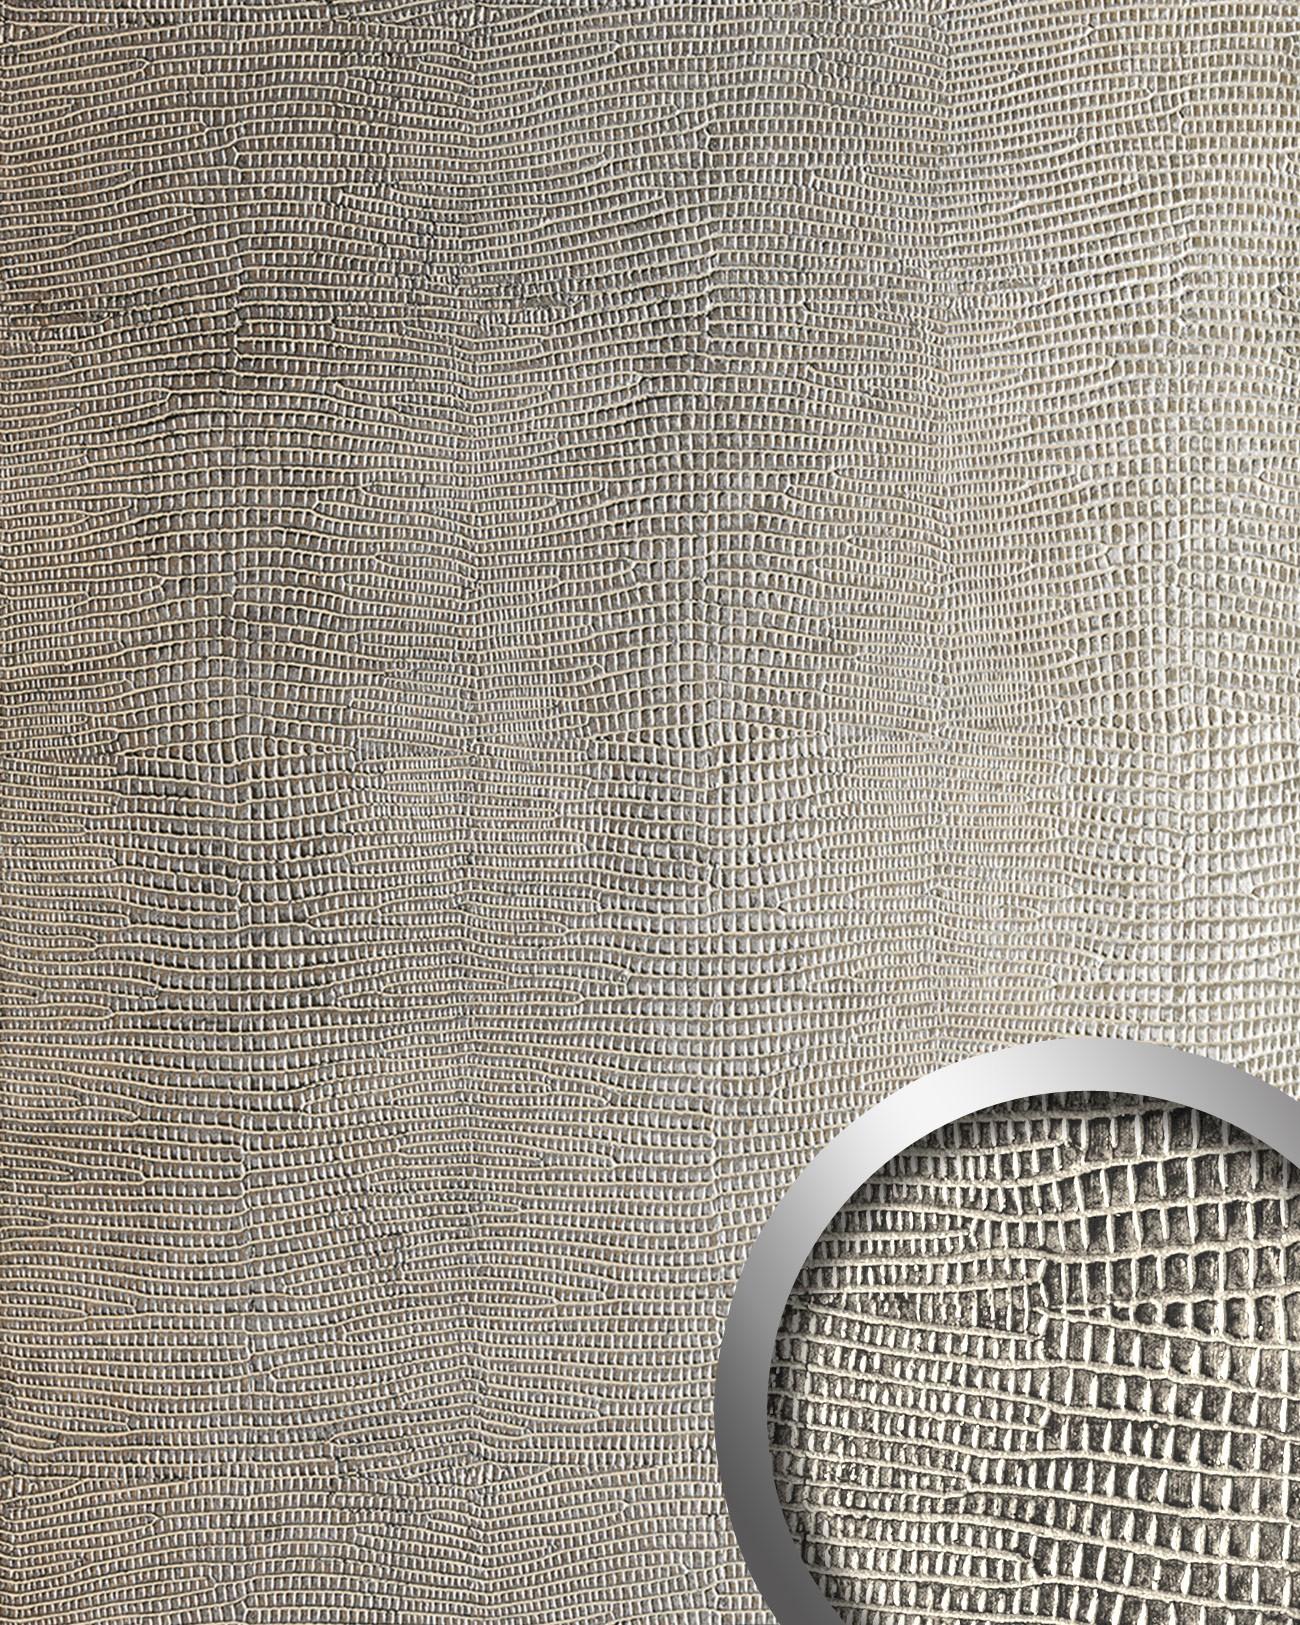 Wandpaneel Leder WallFace 12893 LEGUAN Design Blickfang Deko Selbstklebende  Tapete Wandverkleidung Silber Grau | 2 ...